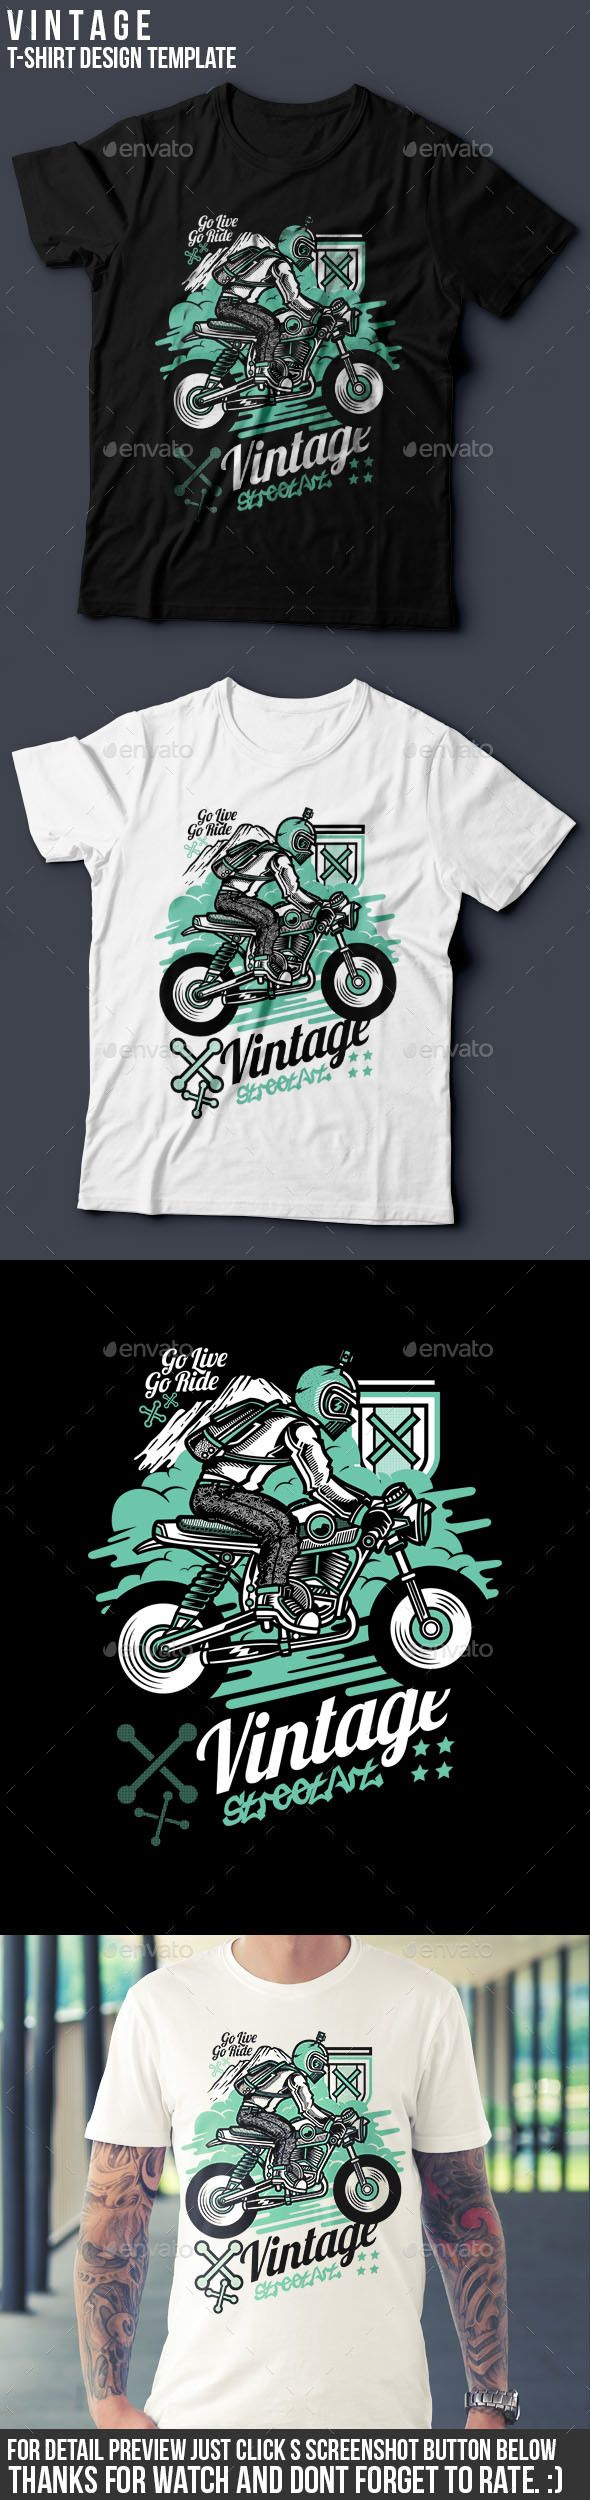 Car body sticker design eps - Vintage T Shirt Design